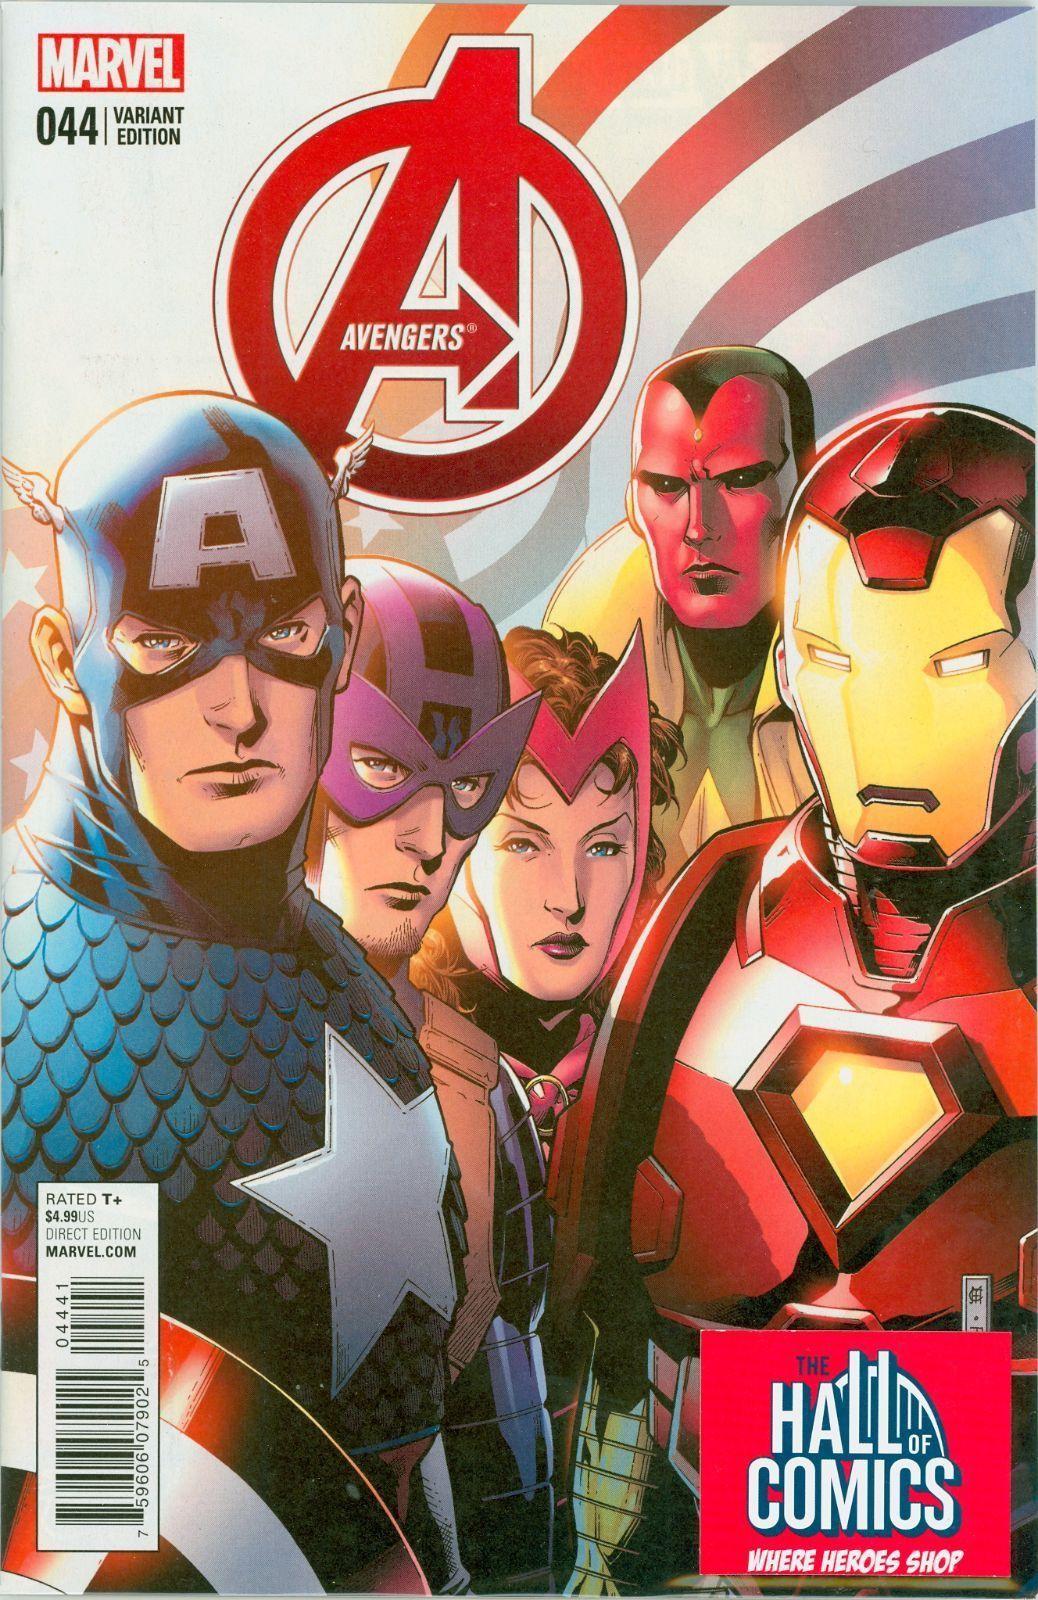 Marvel- Avengers #44 Jim Cheung End of an Era & Tony Harris Variants + Reg Cover